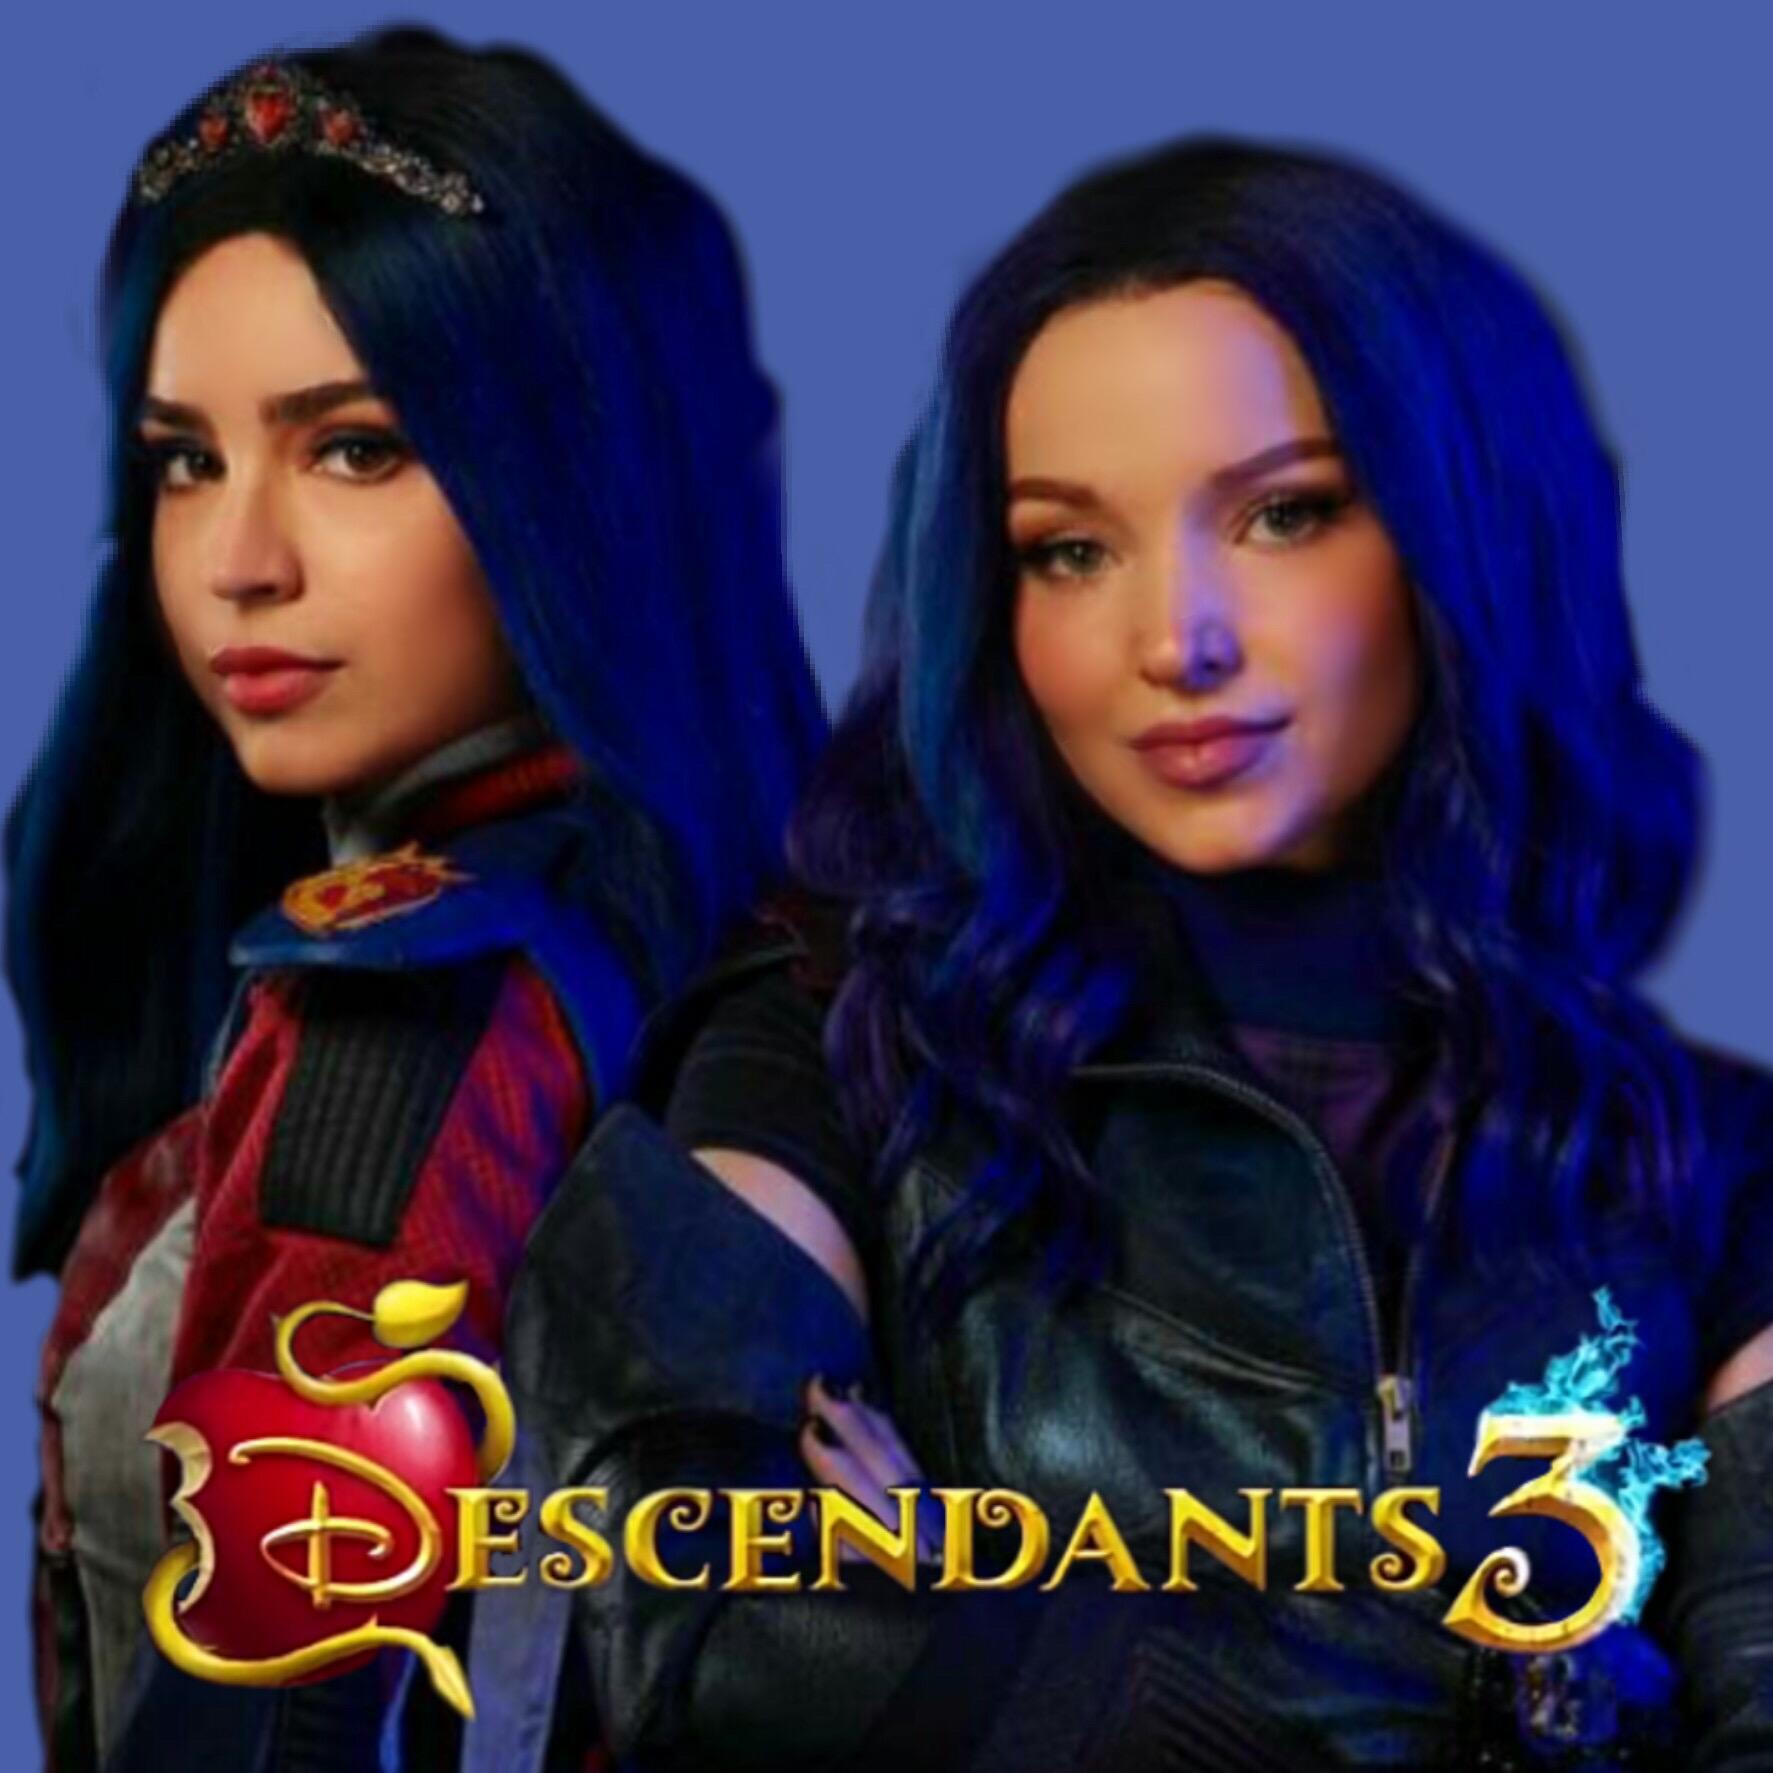 descendants3 mal evie image by